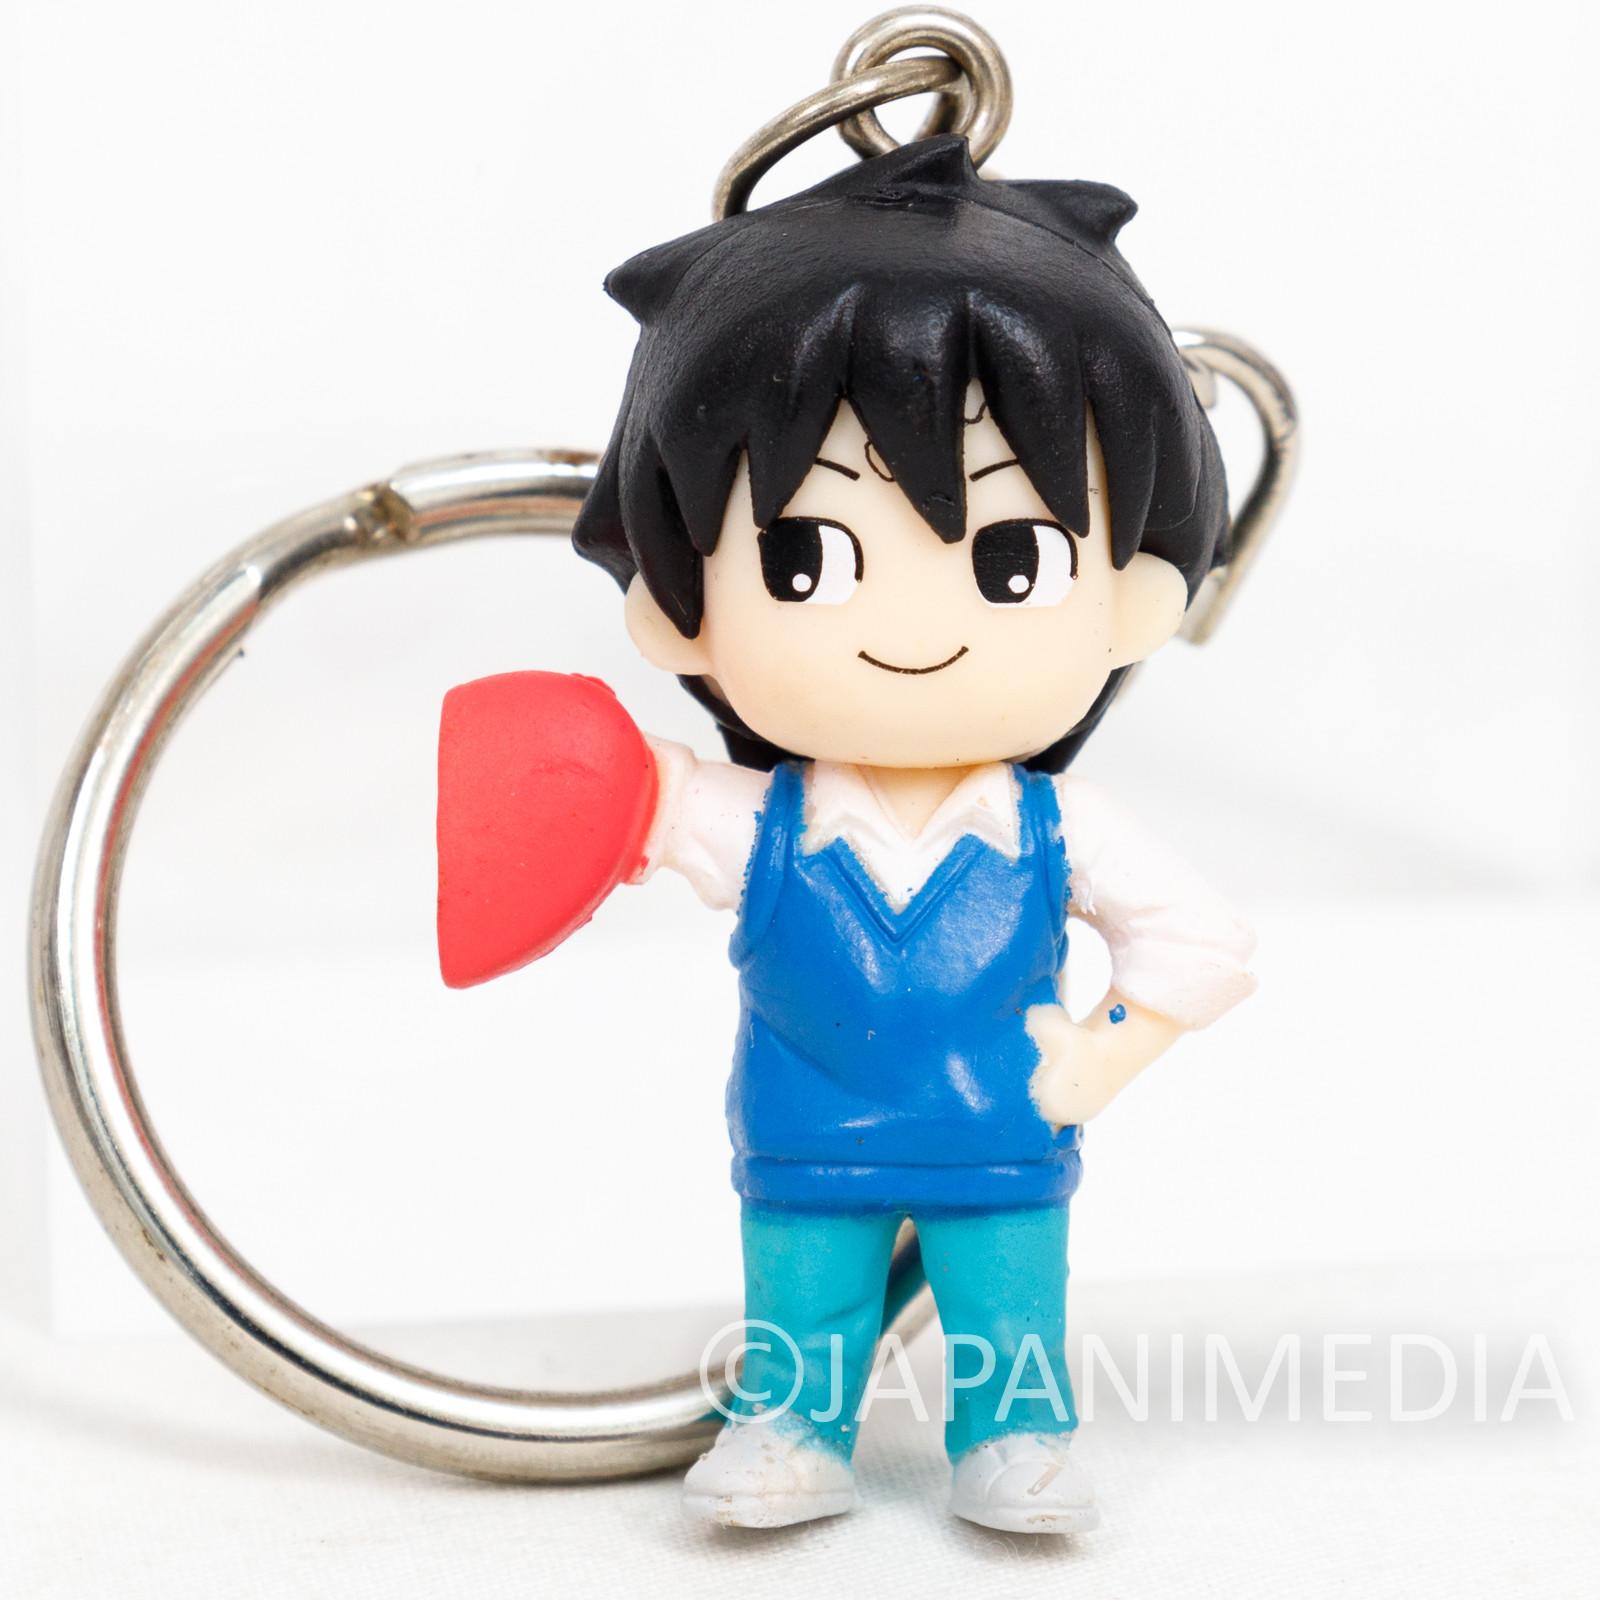 Kimi ni Todoke Kazehaya Shota Mascot Figure Key Chain JAPAN ANIME MANGA (No box)